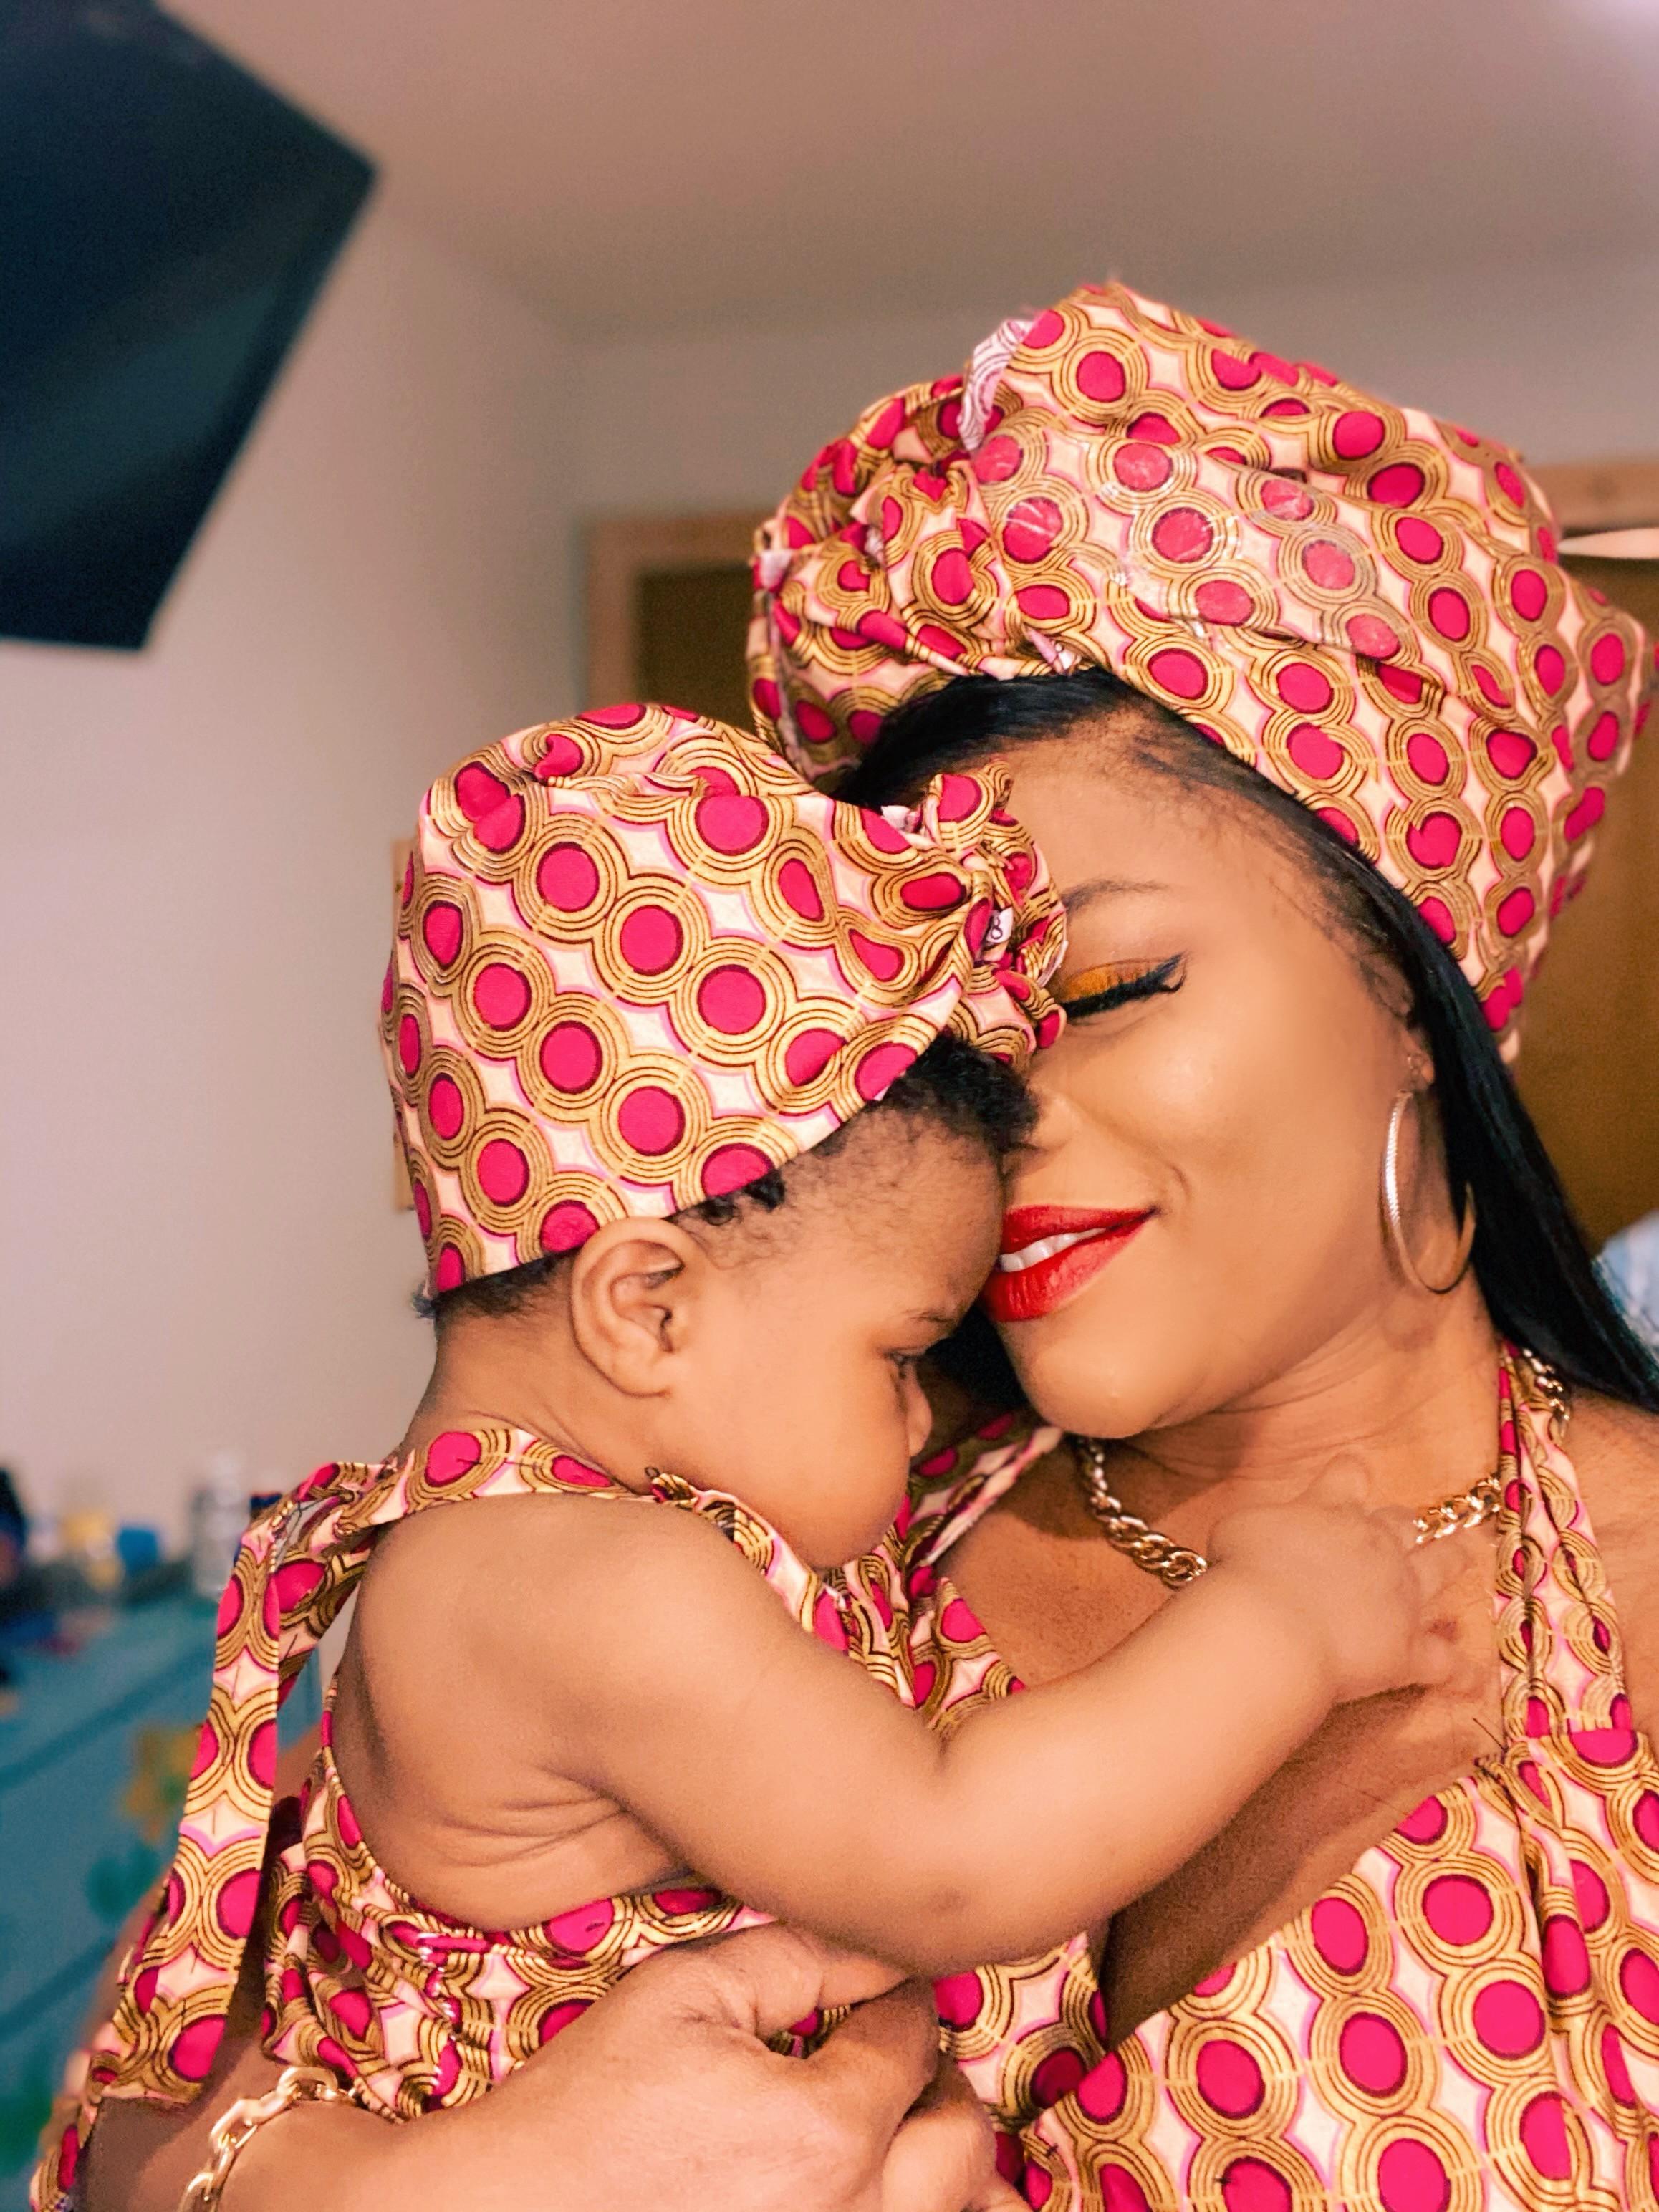 Laura Ikeji-Kanu and her daughter, Laurel, twin in Ankara (photos)